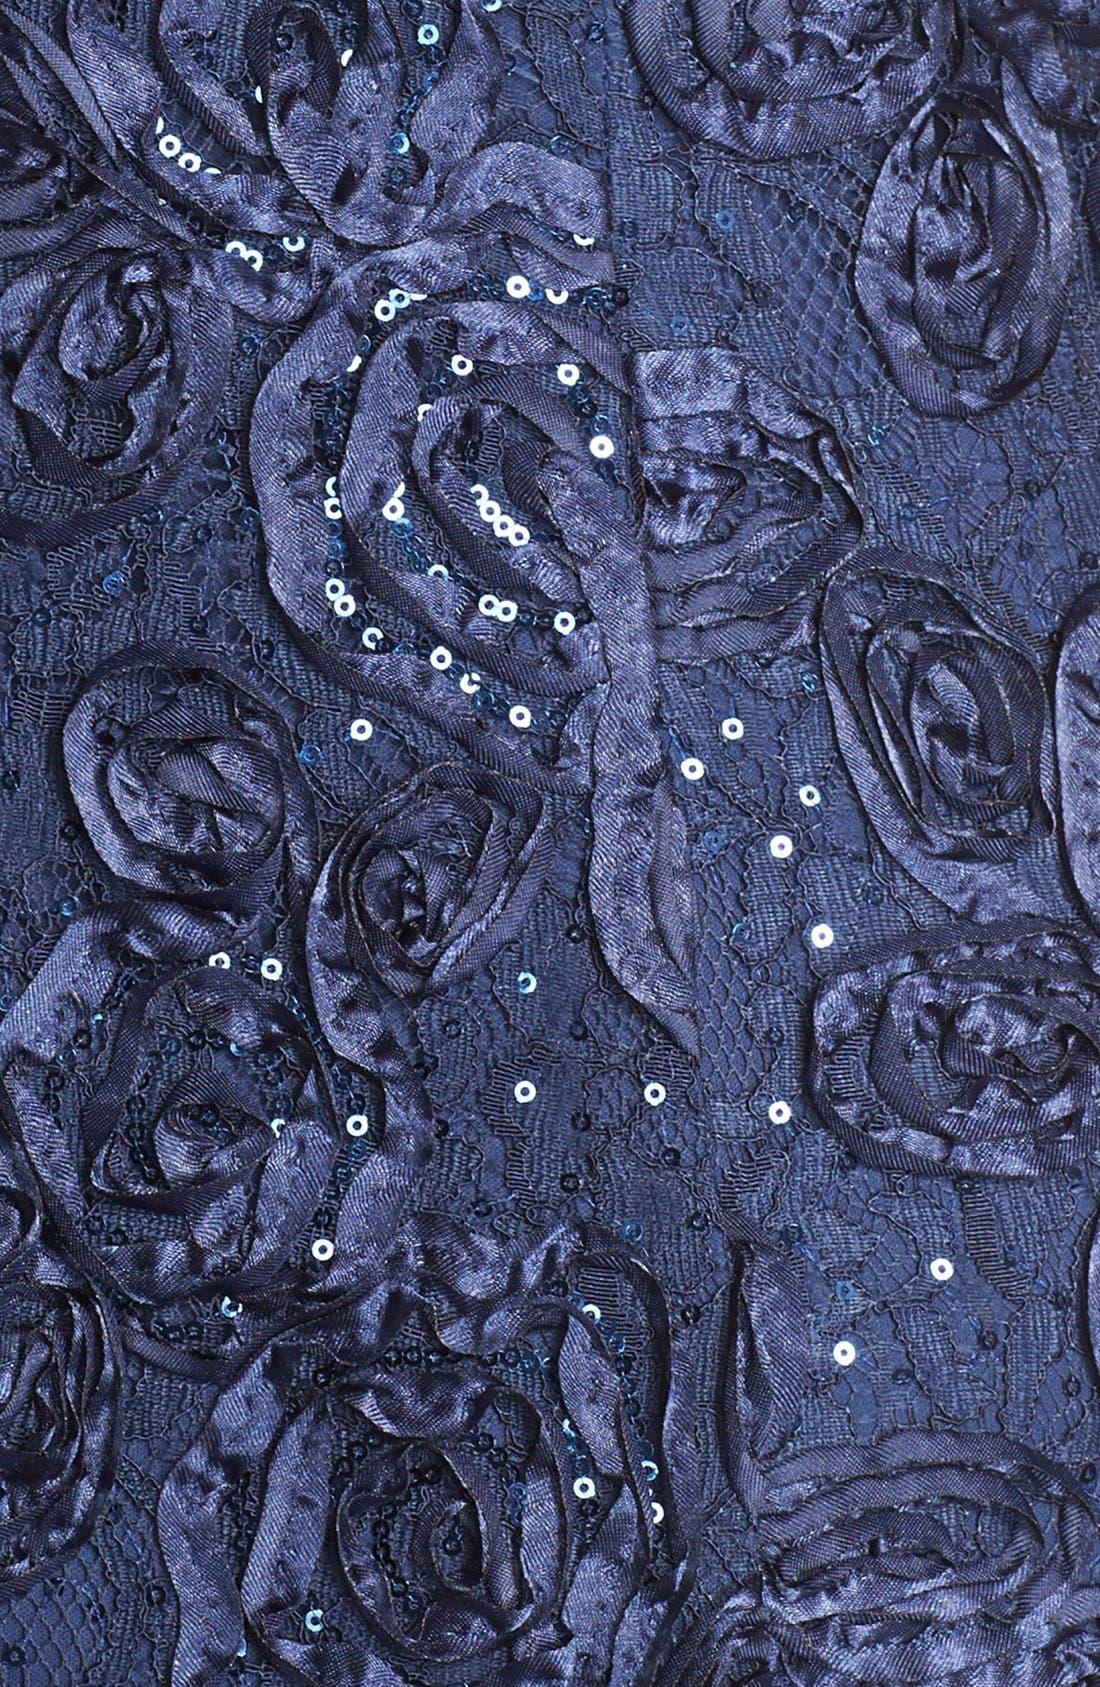 Rosette Lace Short Sleeve A-Line Gown,                             Alternate thumbnail 10, color,                             NAVY